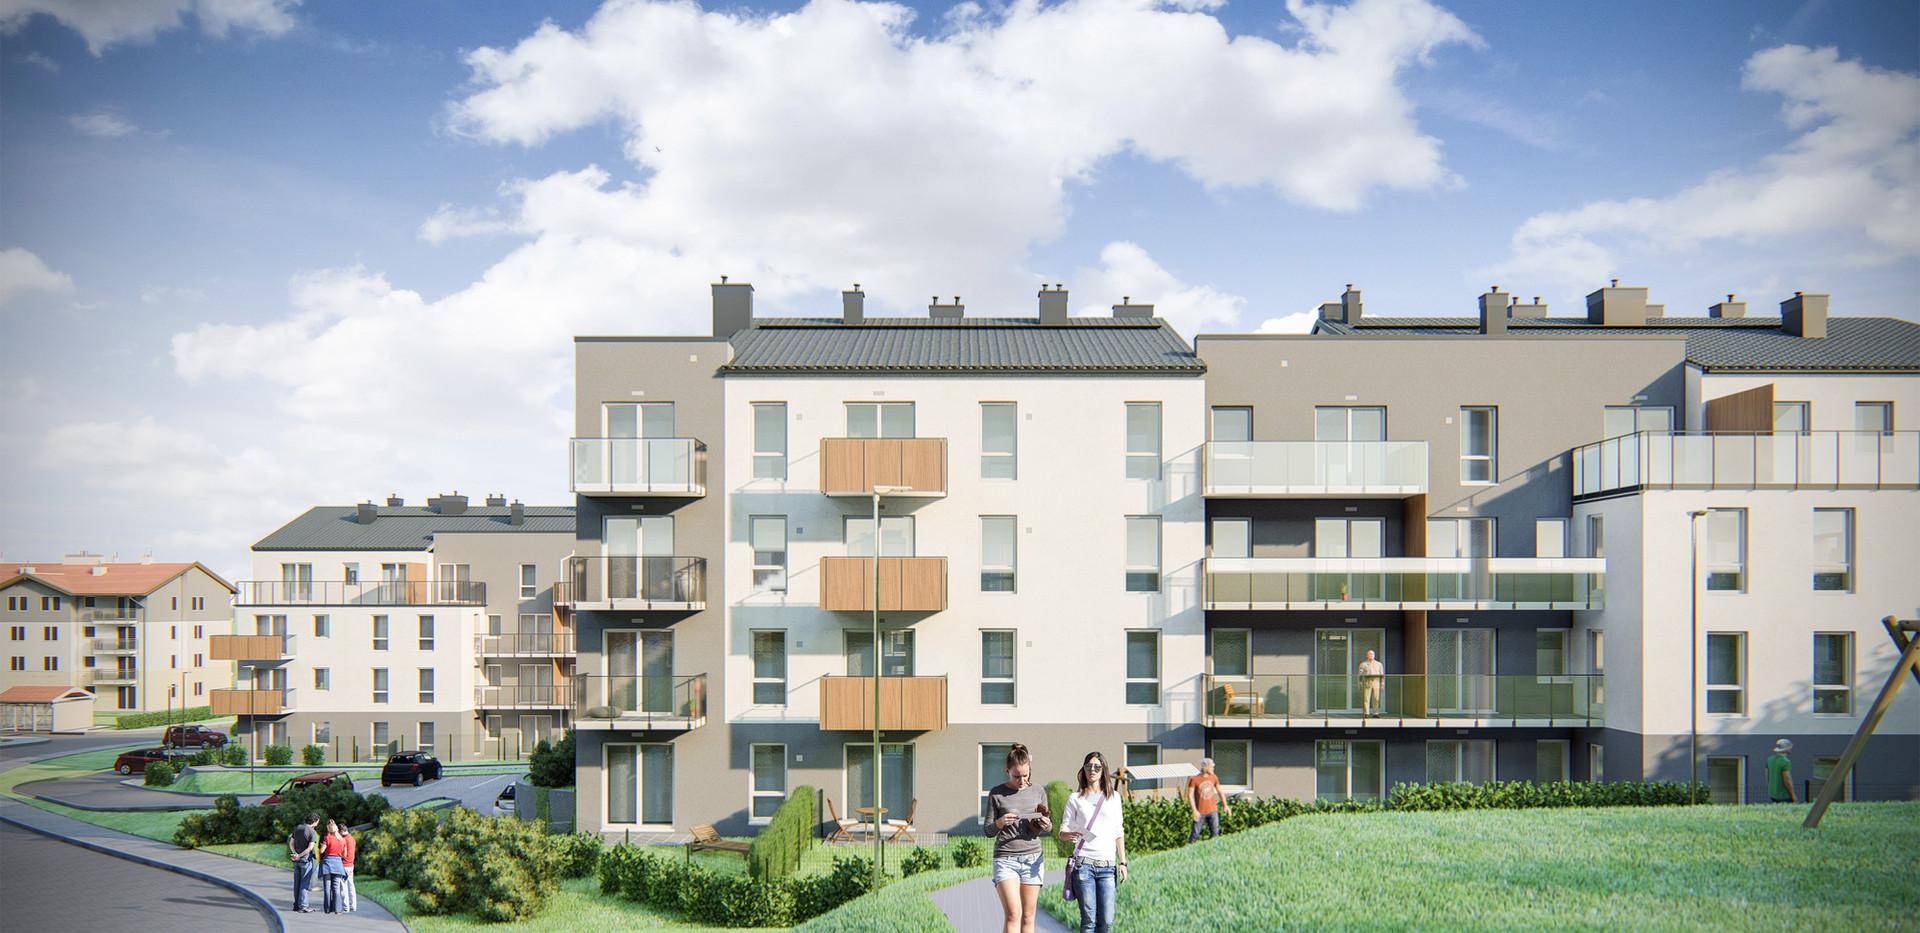 Nowe mieszkania Gdańsk kowale